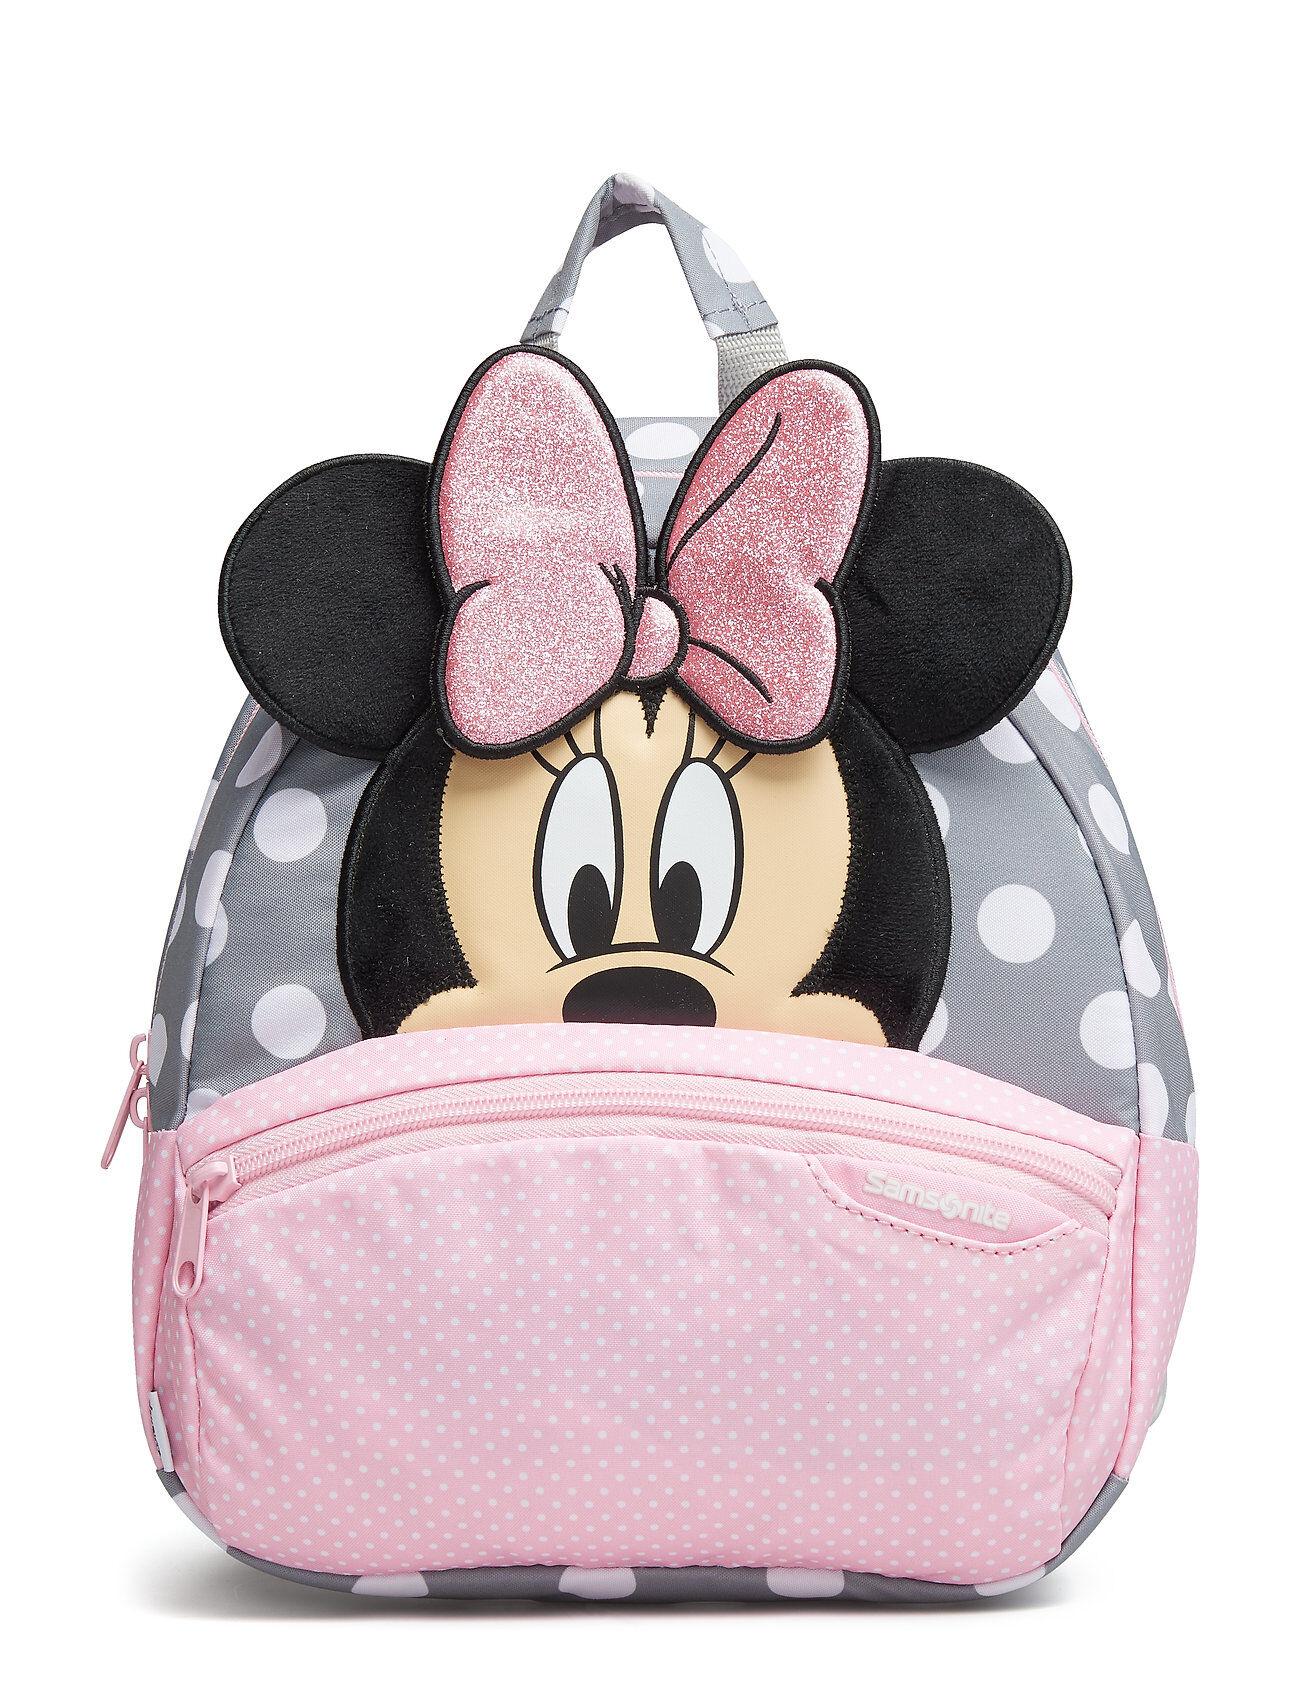 Samsonite Disney Tm Ultimate Backpack S*